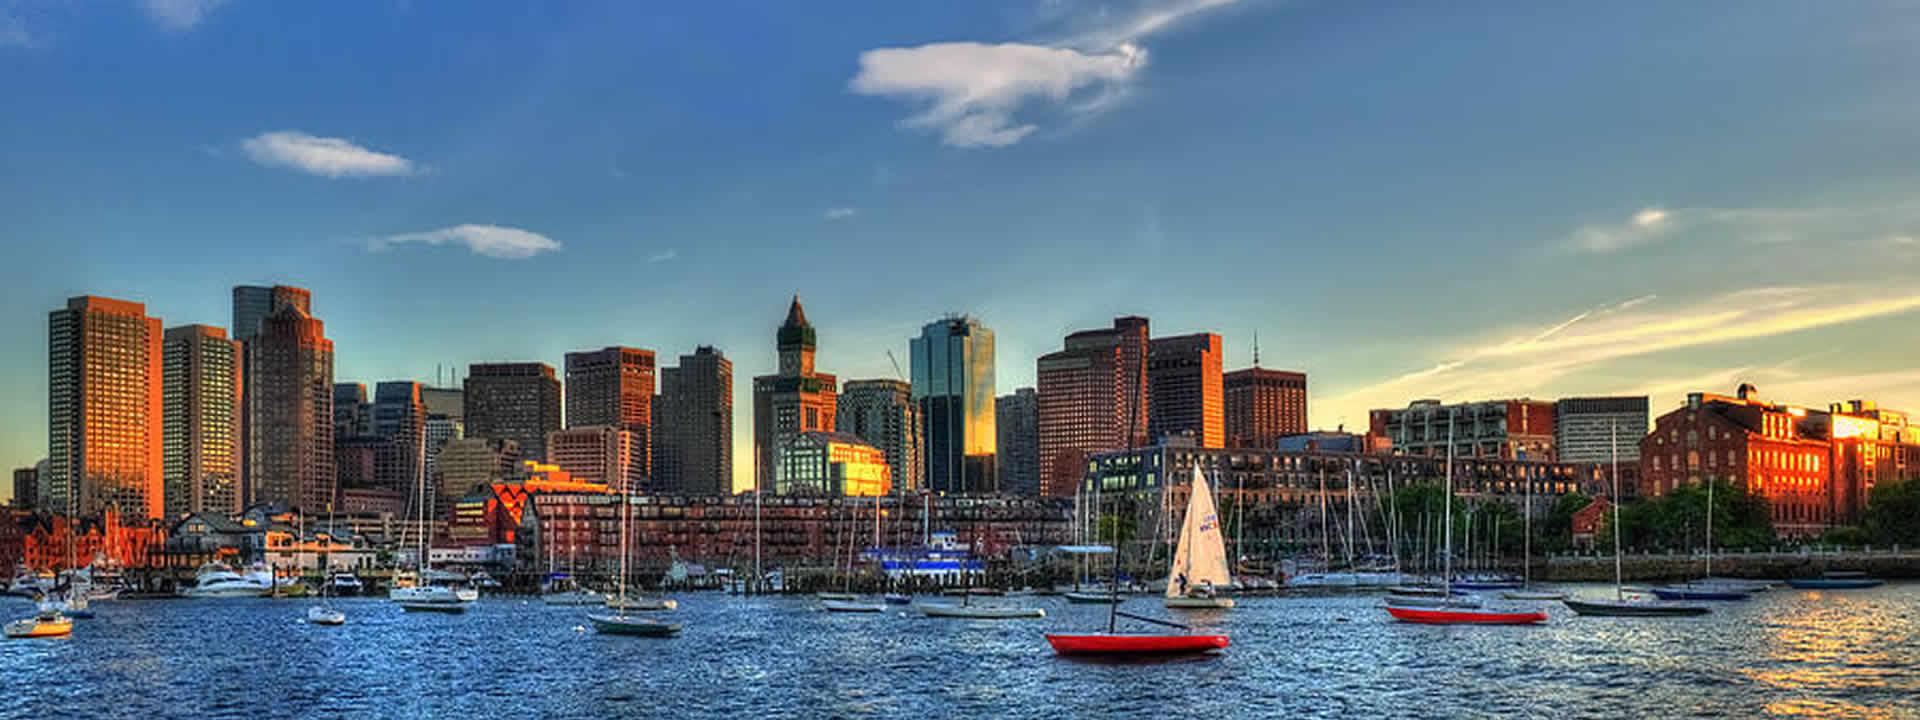 Boston Private Jet Charter Skyline